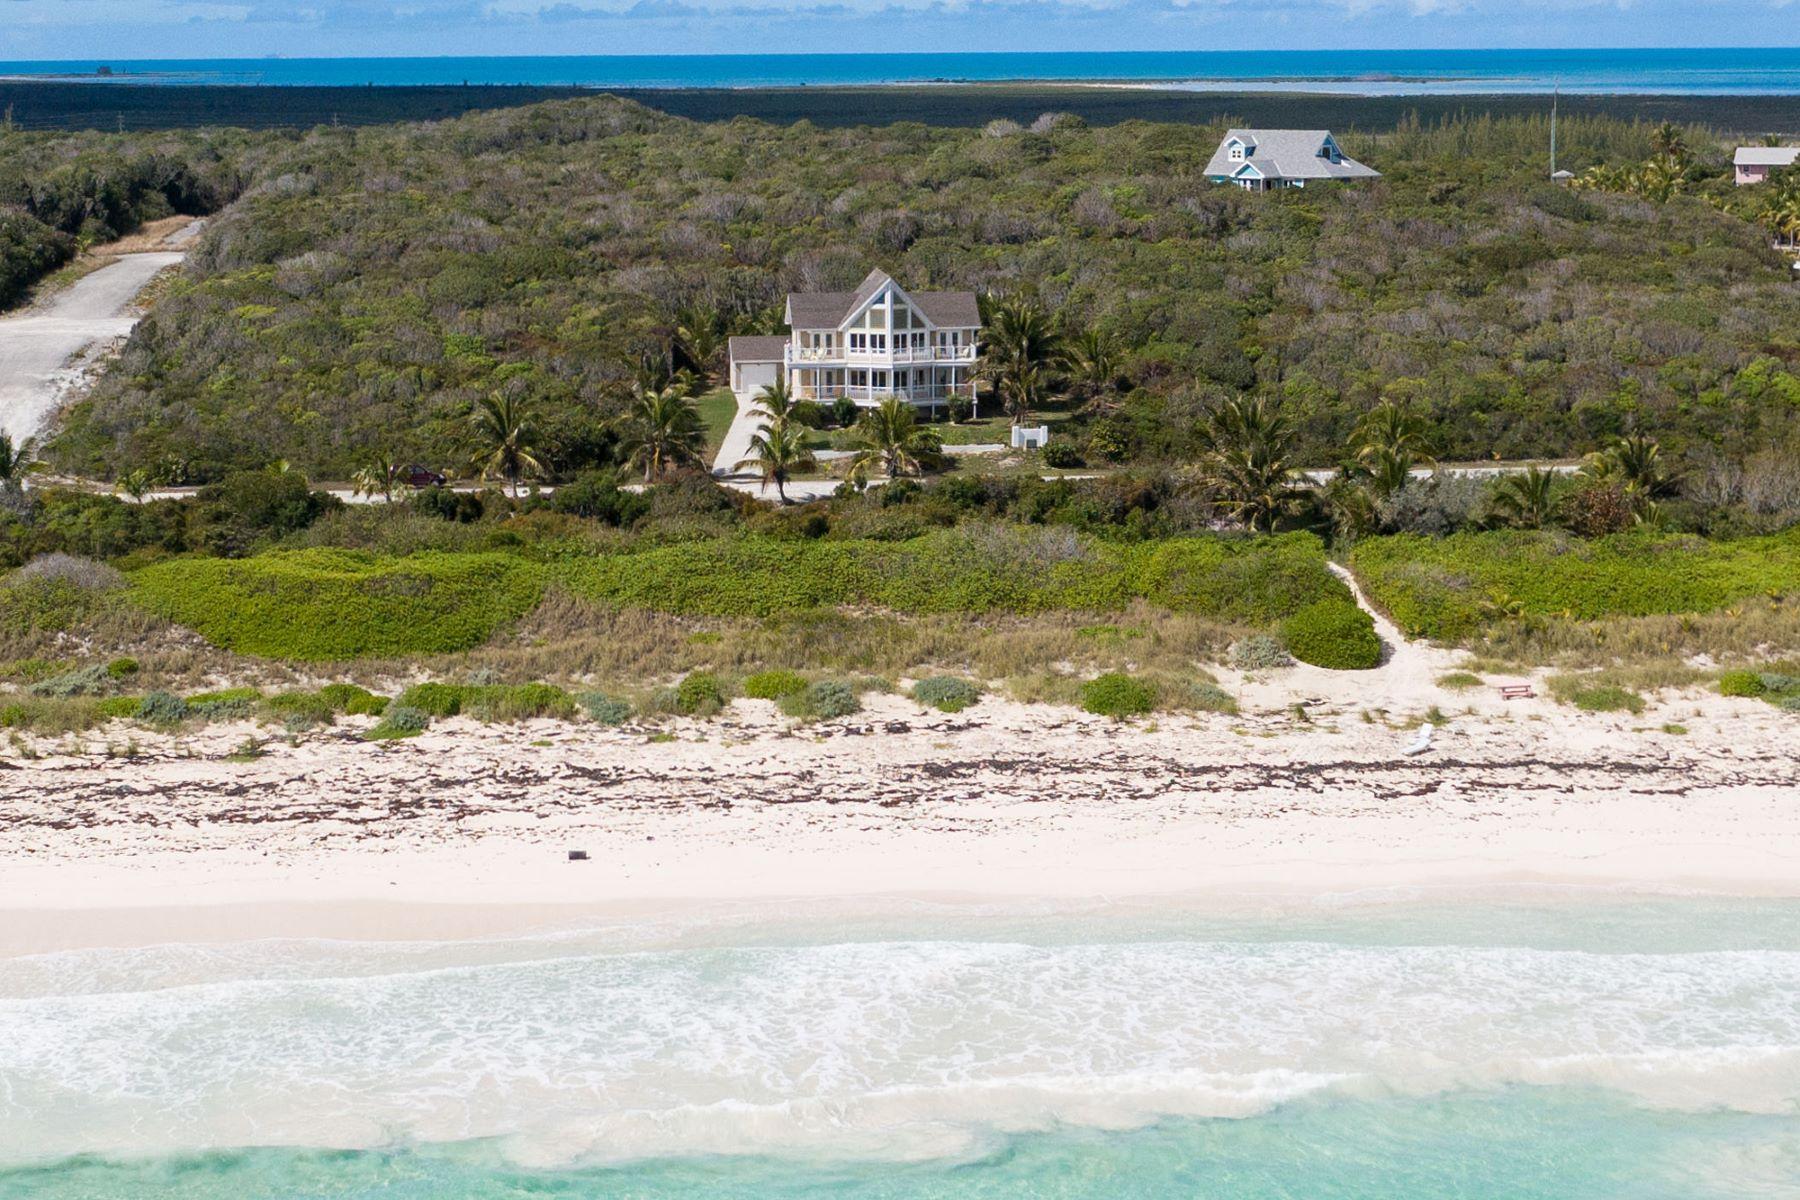 Single Family Homes for Sale at Long Beach, Abaco Bahamas